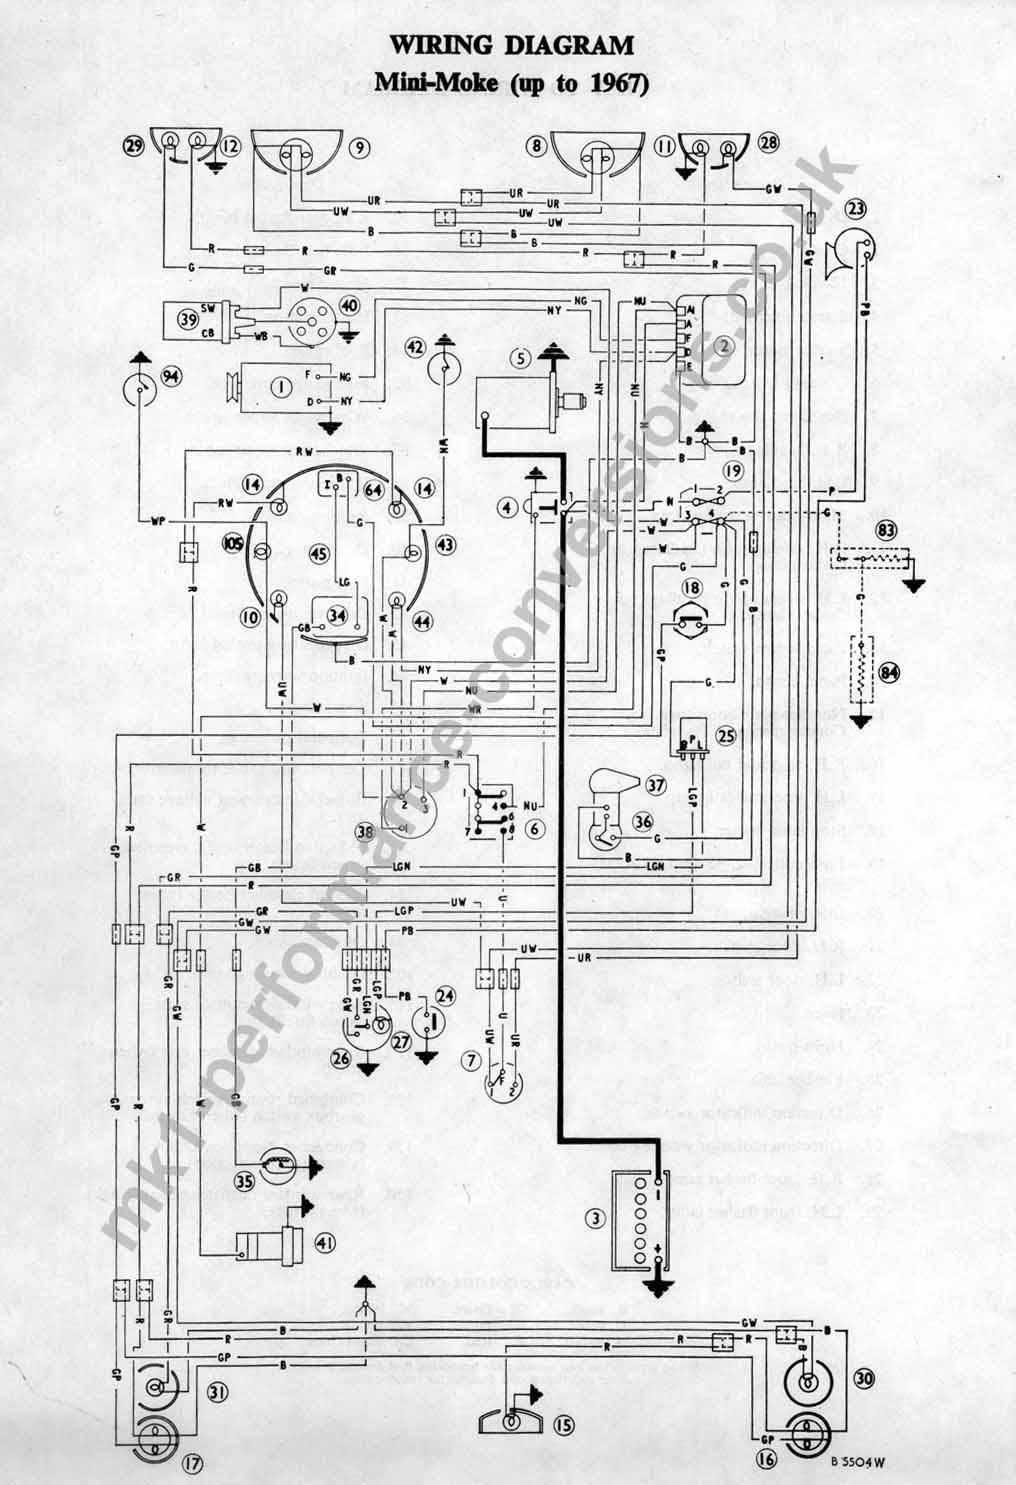 hight resolution of 2004 mini cooper s engine diagram 2002 mini cooper s wiring diagram austin mini 1000 wiring